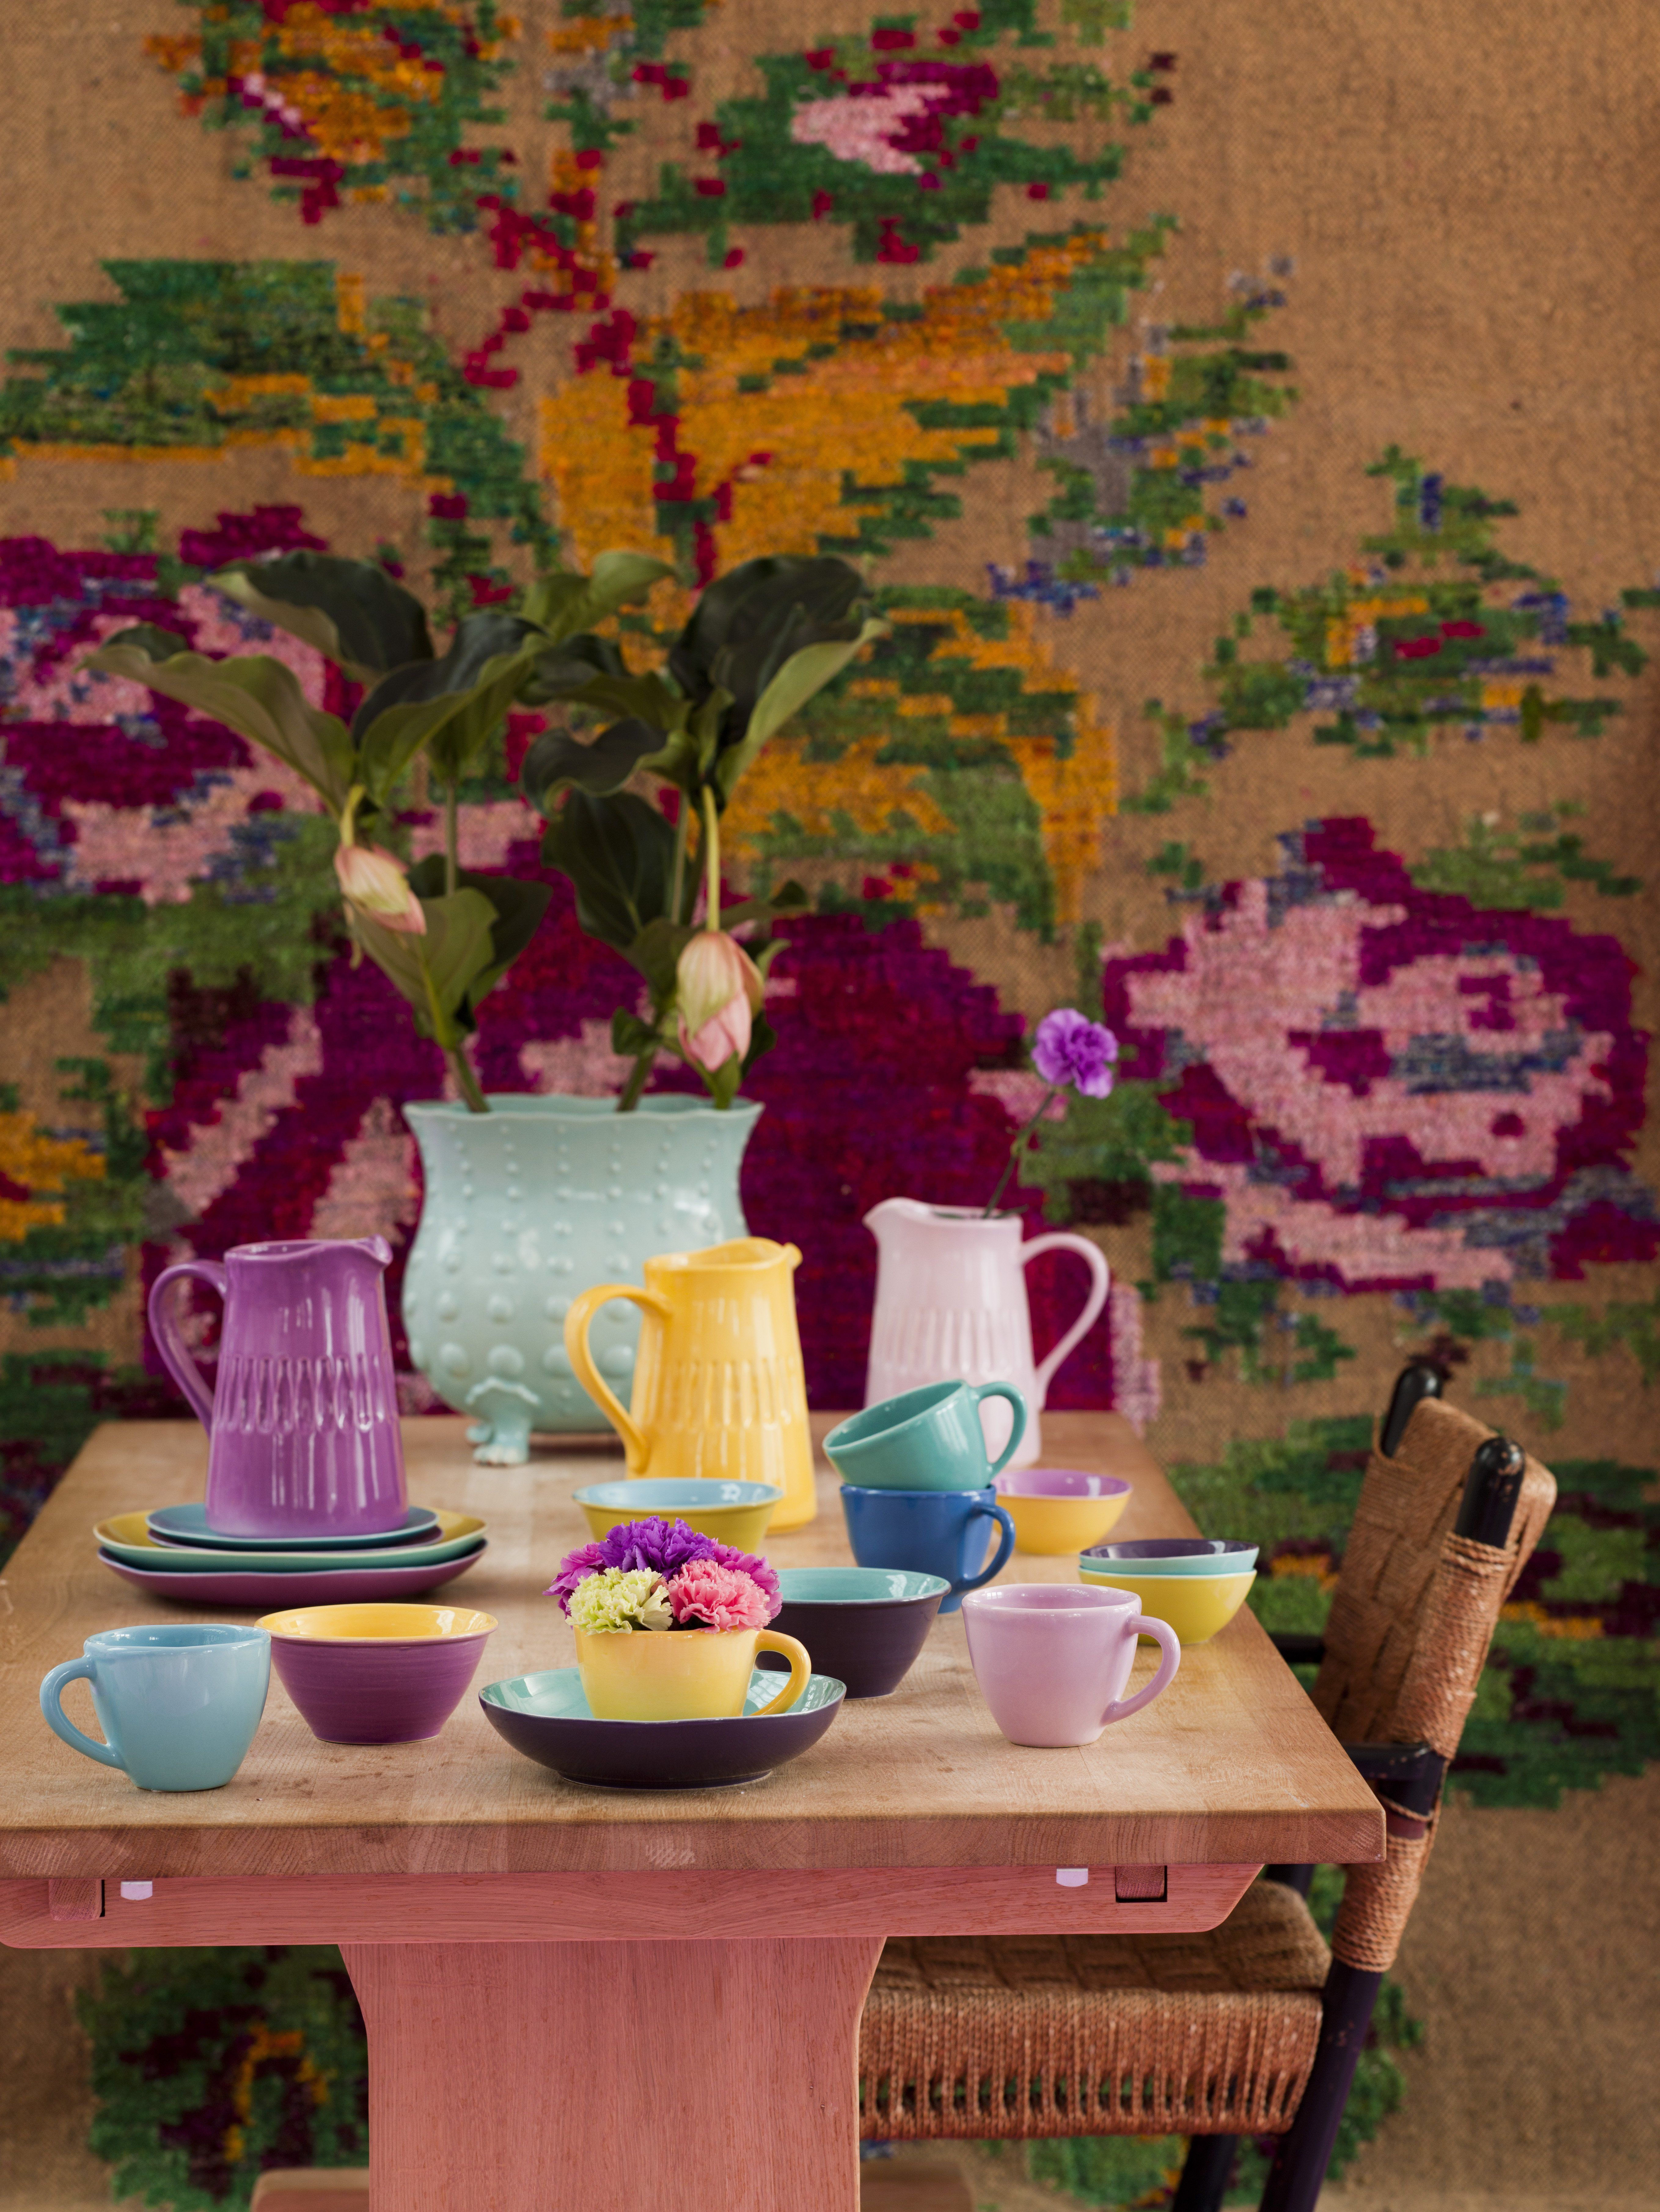 RICE Ceramics Tableware from Portogal